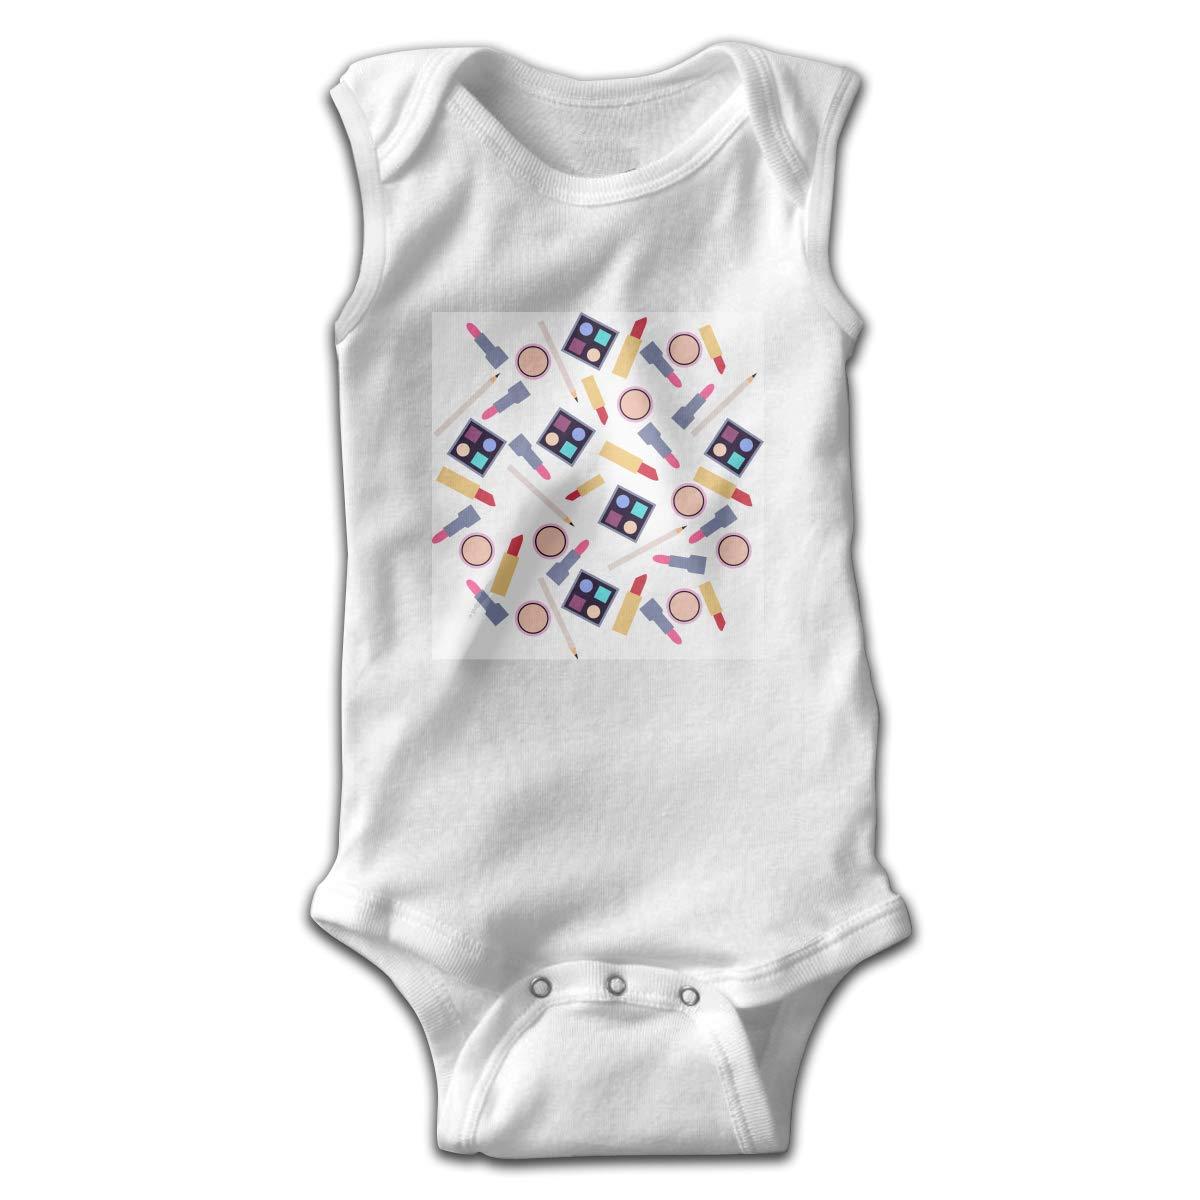 Efbj Toddler Baby Boys Rompers Sleeveless Cotton Onesie,Lipstick Make Up Bodysuit Spring Pajamas